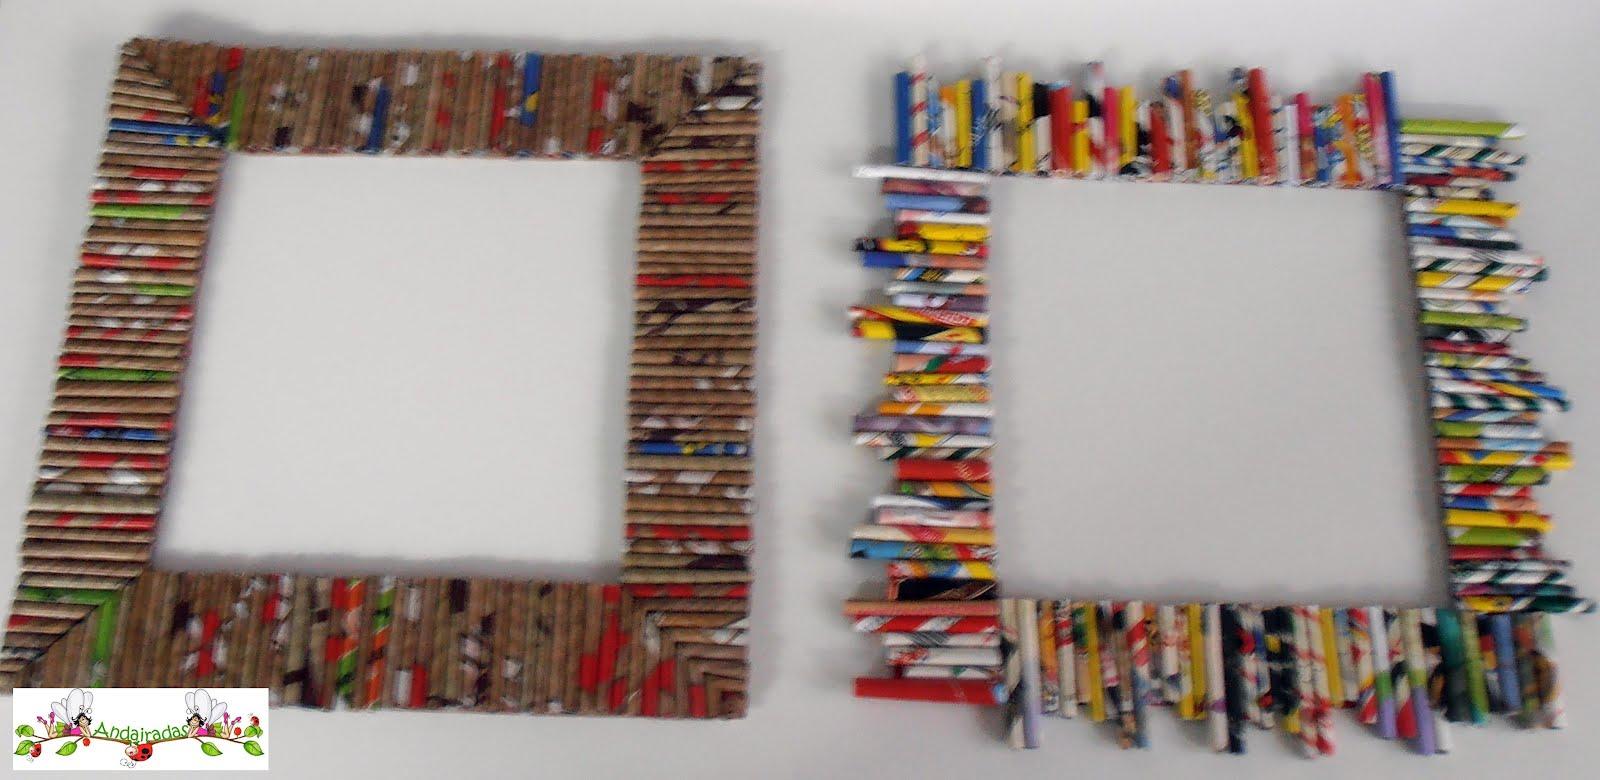 Andairadas marcos hechos con rollitos de papel - Marcos fotos manualidades ...